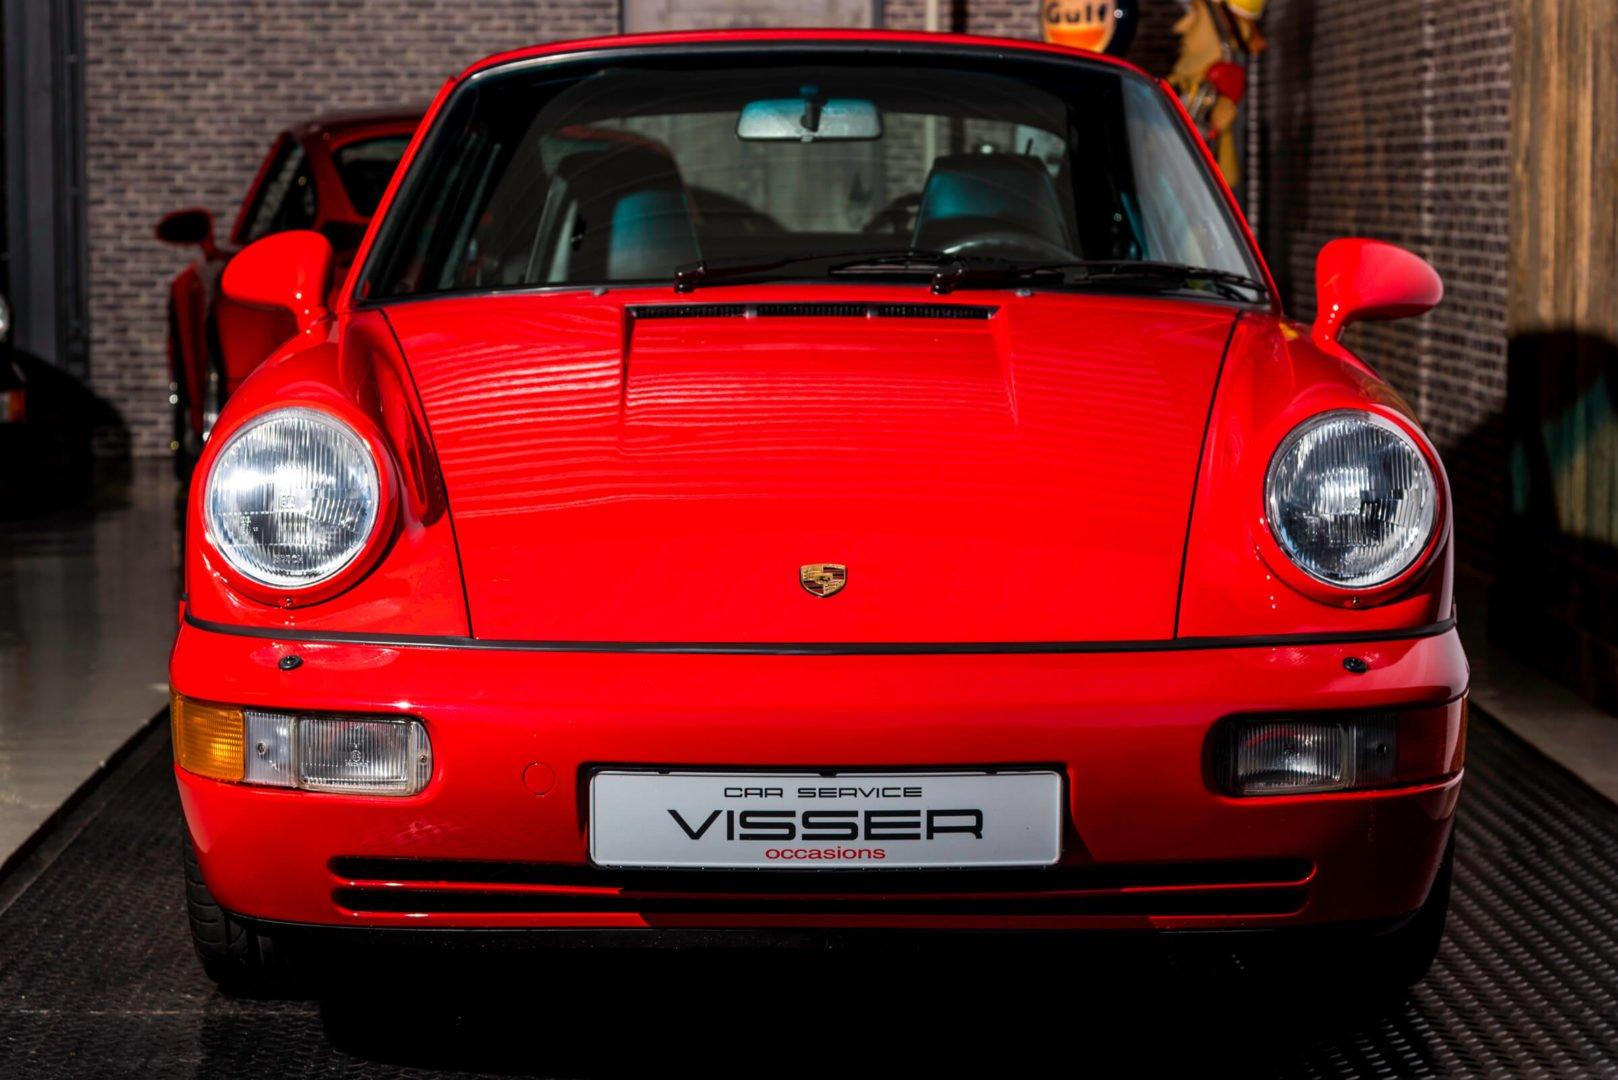 Porsche 964 Carrera 2 coupé Indischrot